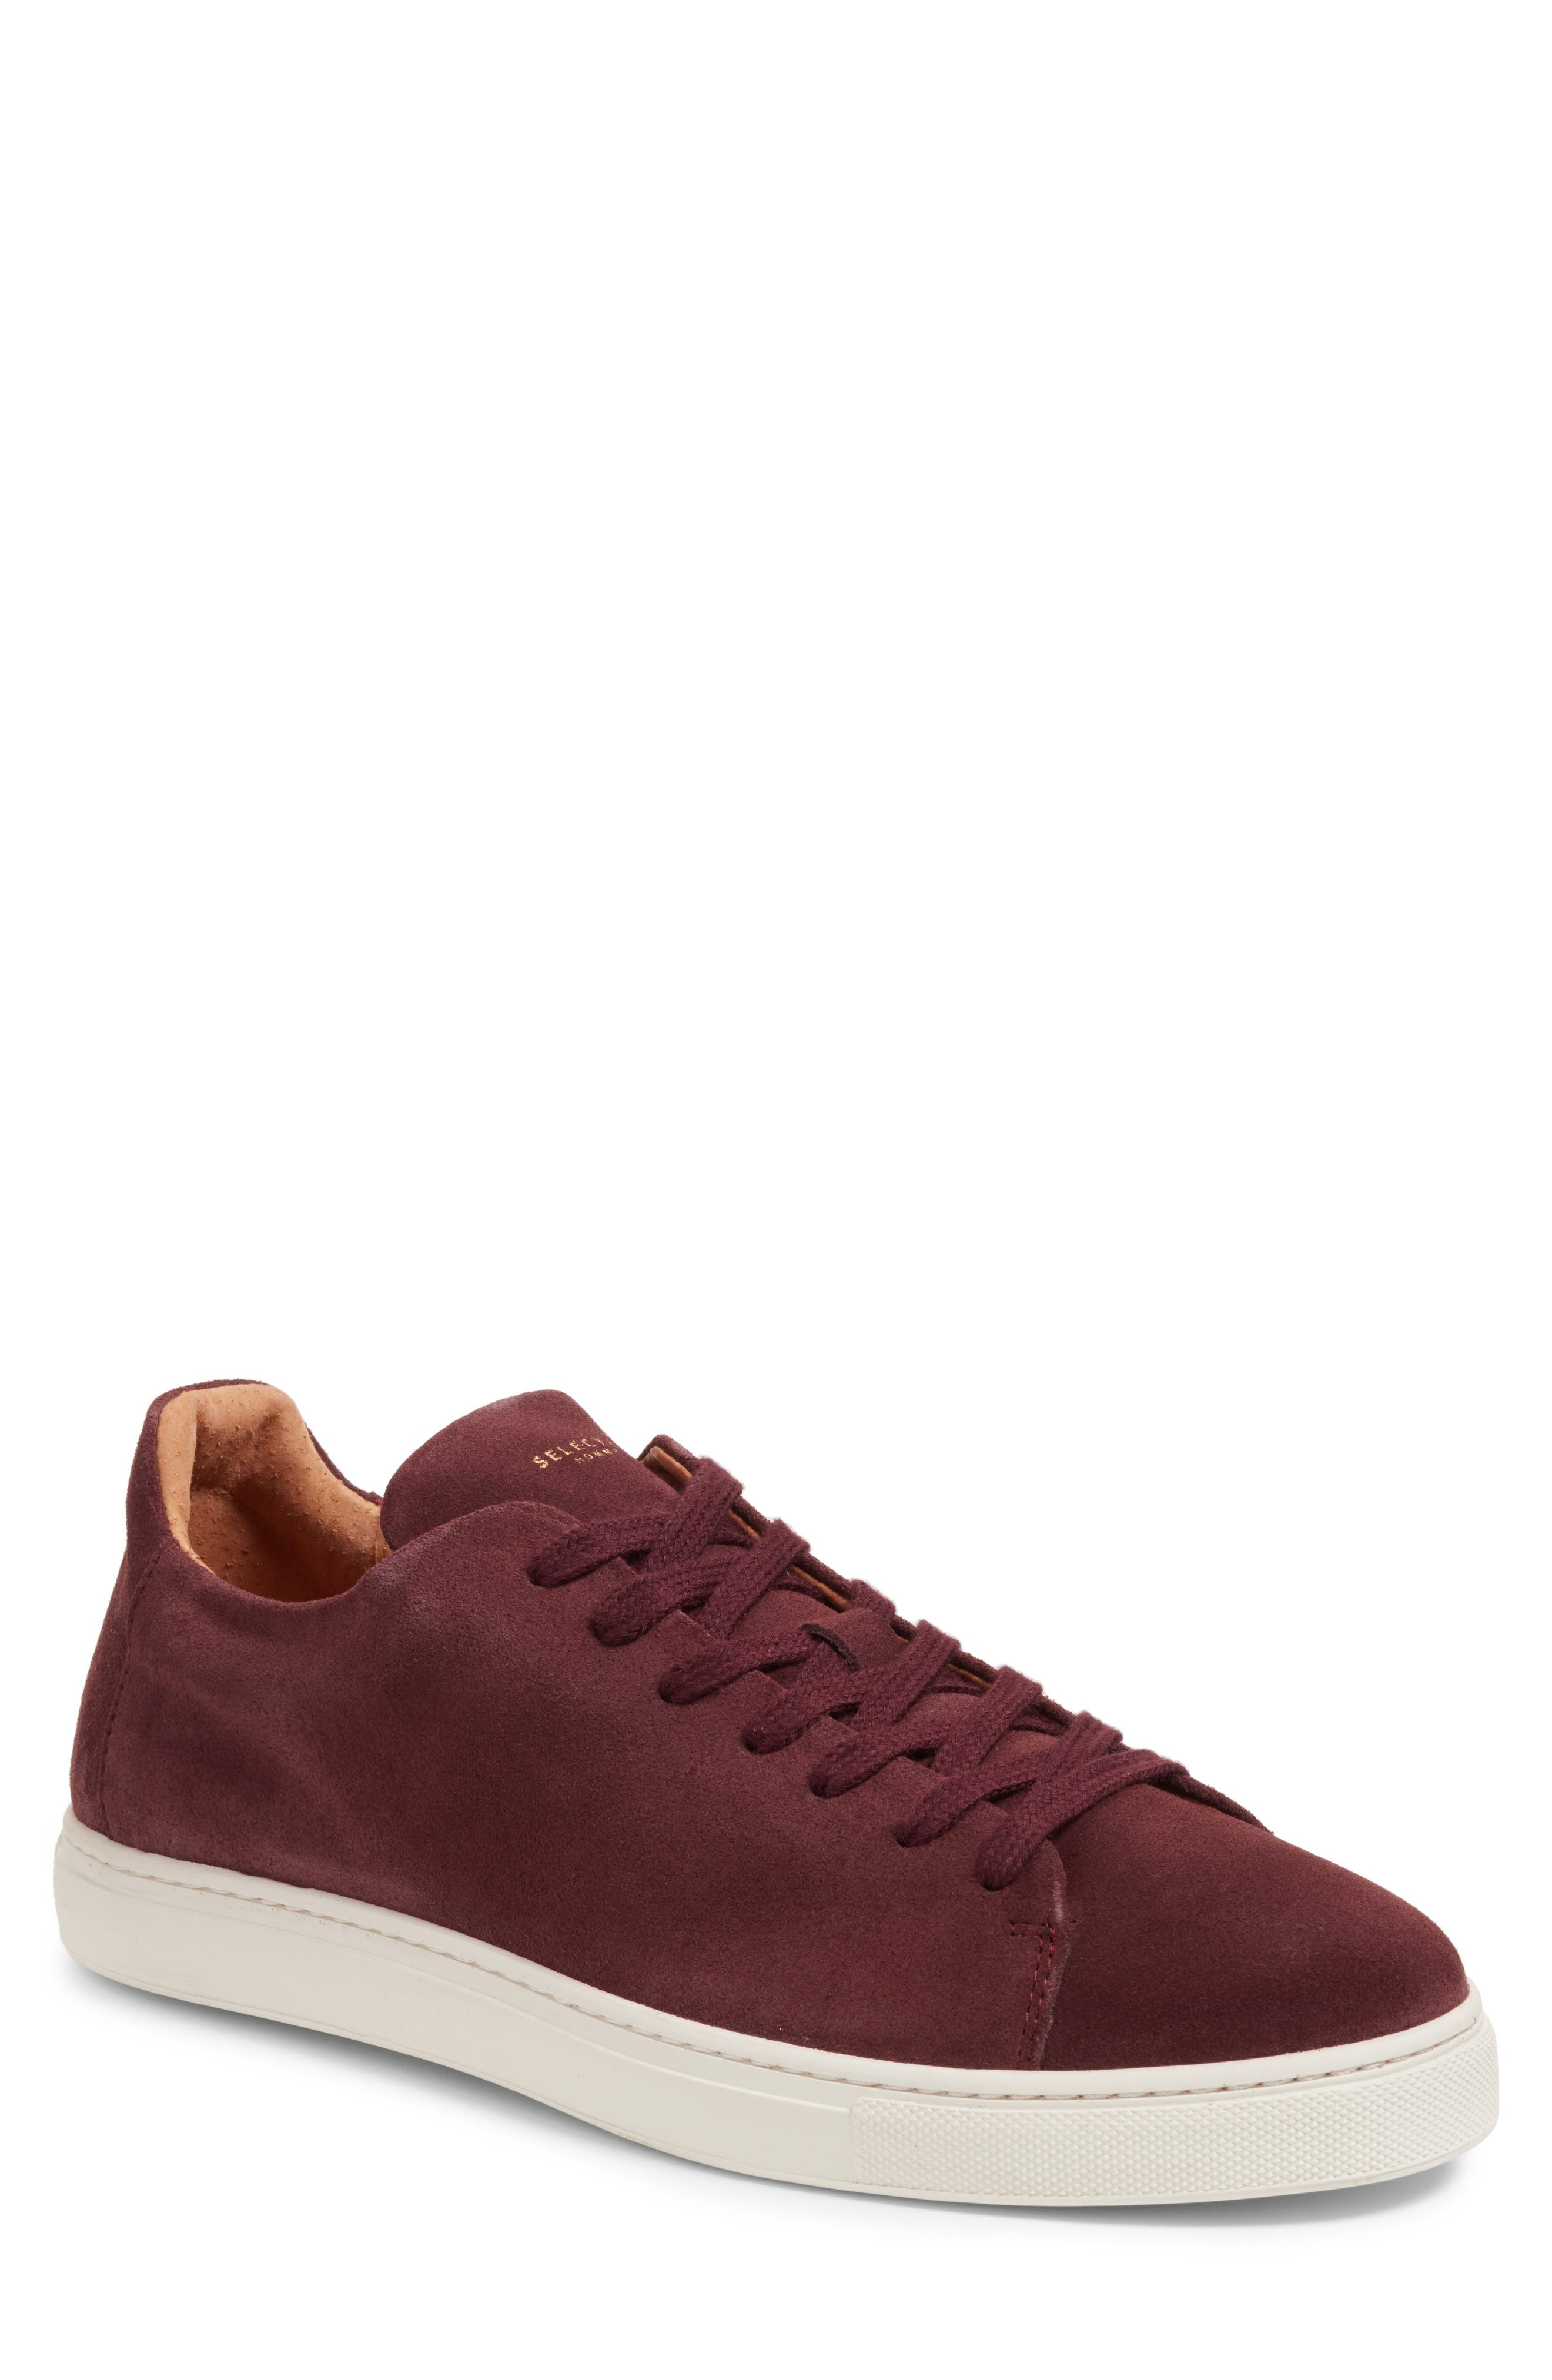 Selected Homme David Sneaker (Men)